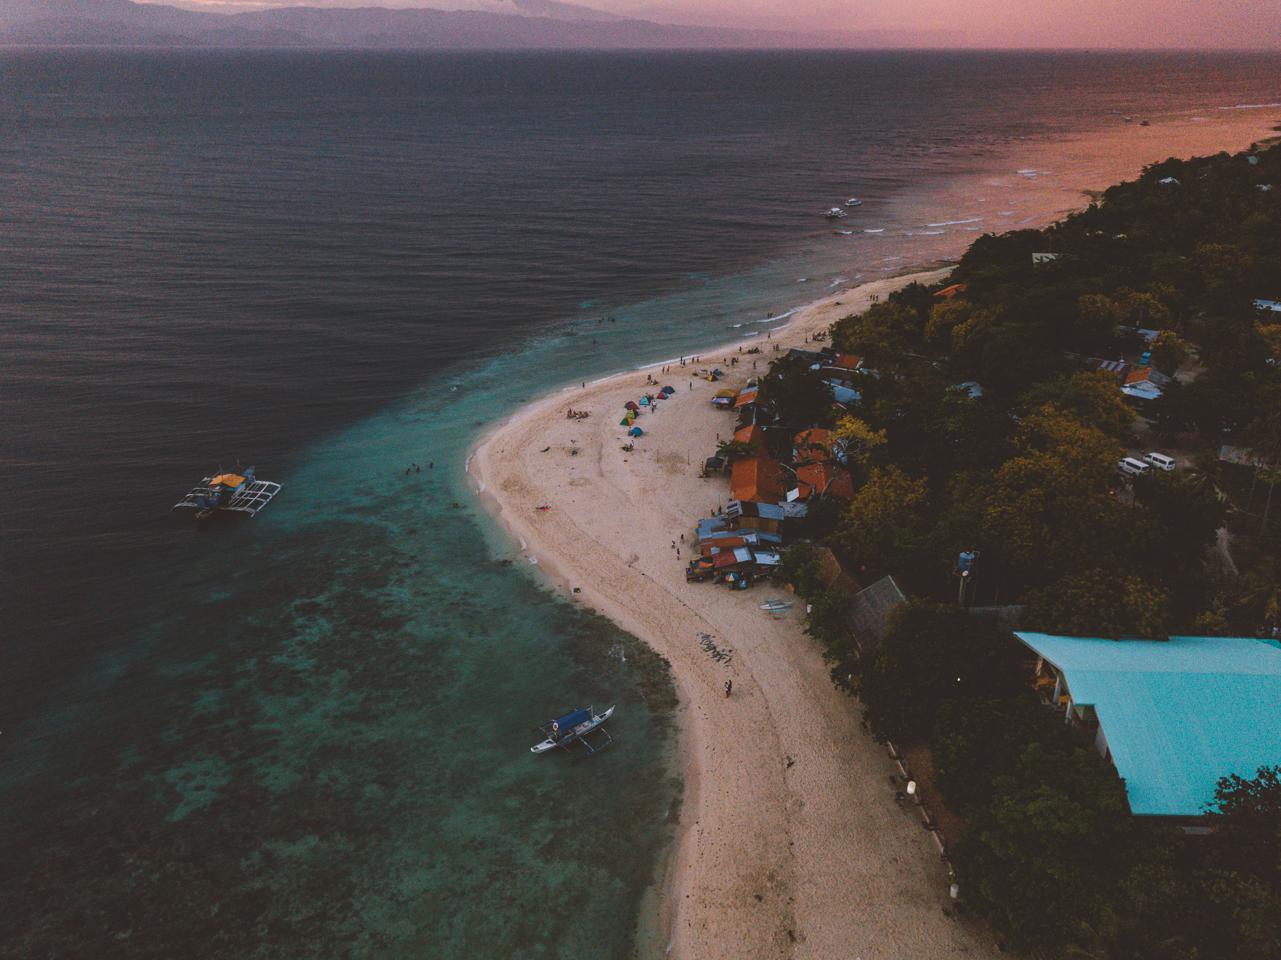 Philippines-1-28.jpg